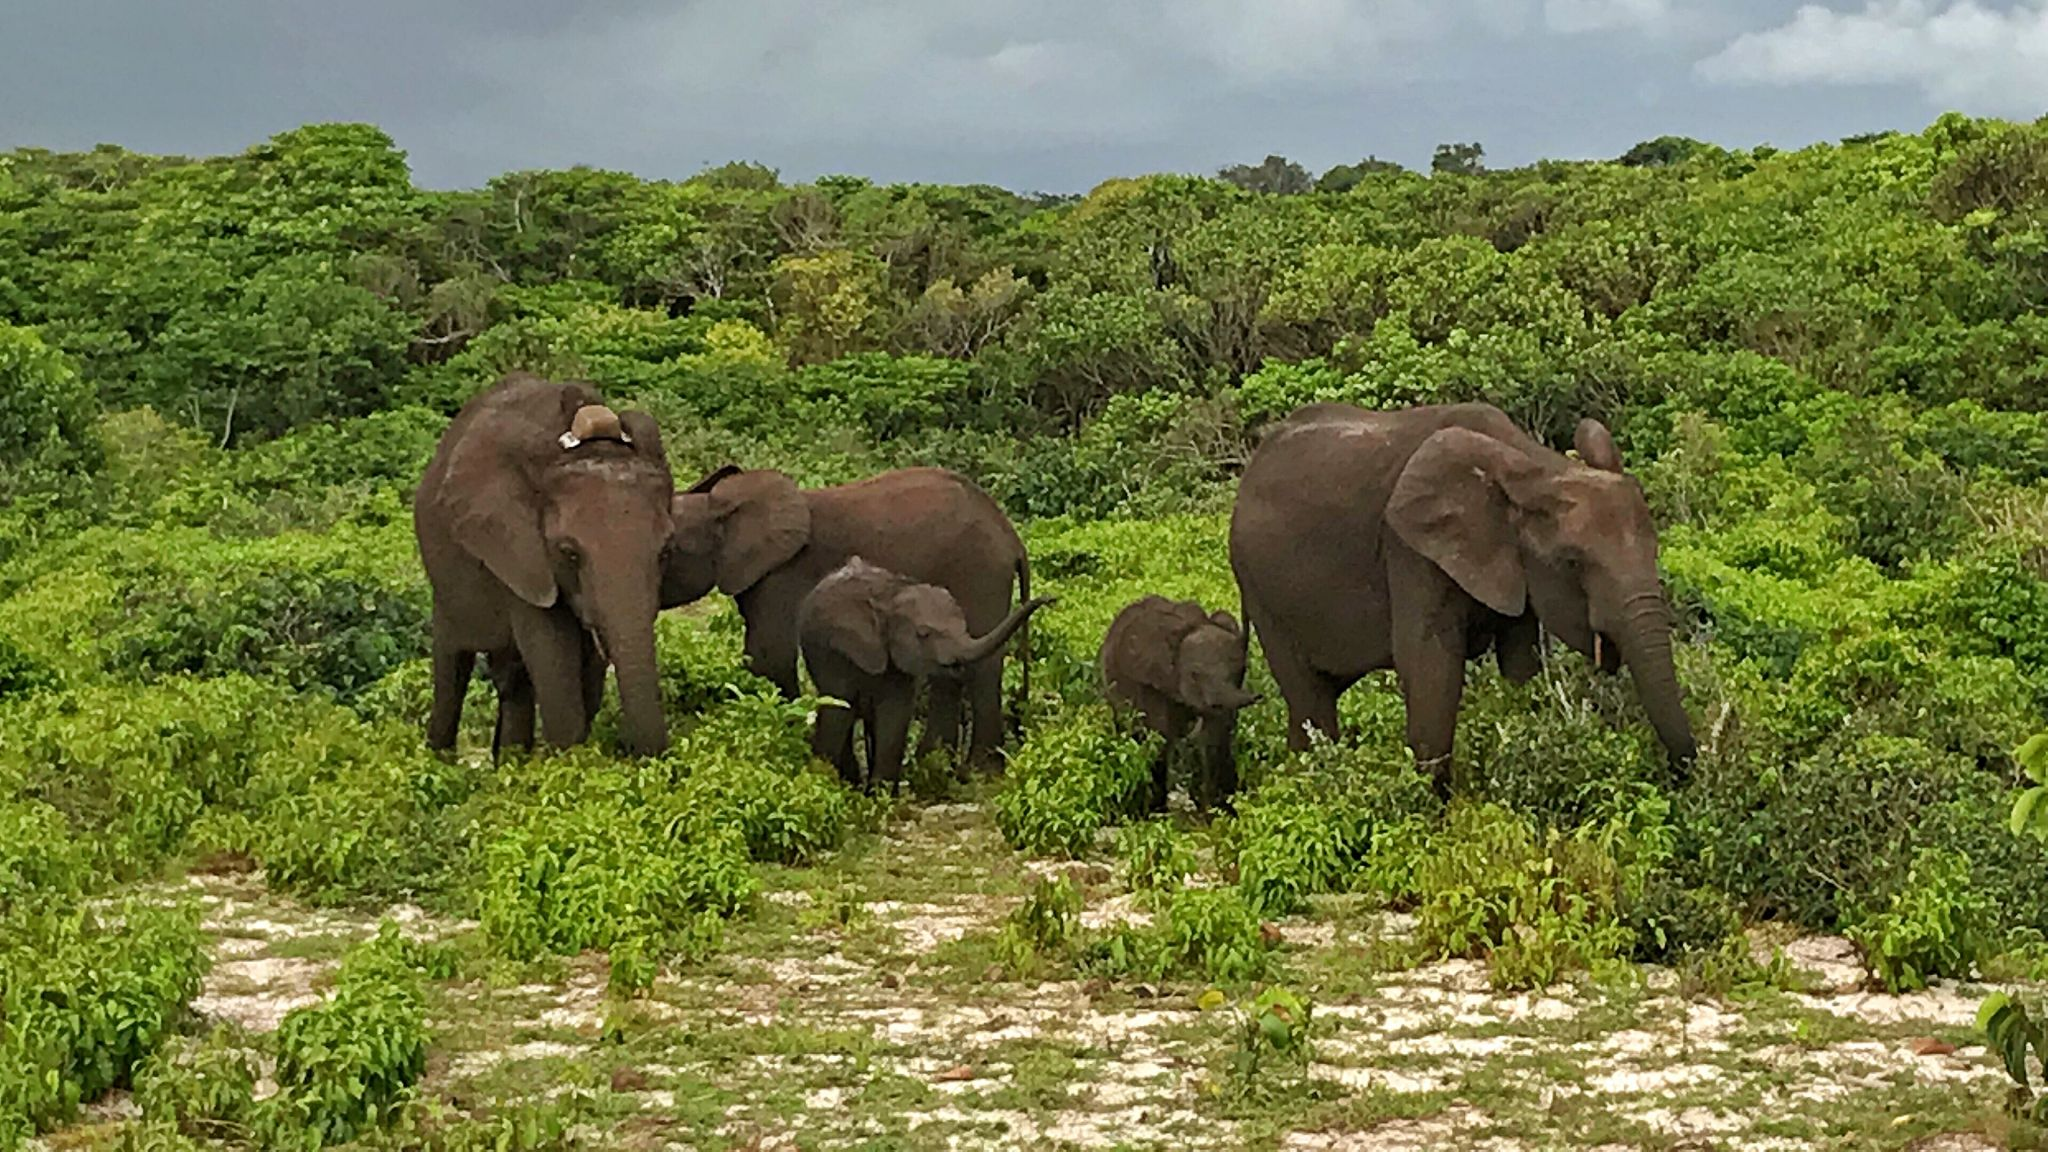 Forest elephants on shoreline in Loango National Park, Gabon